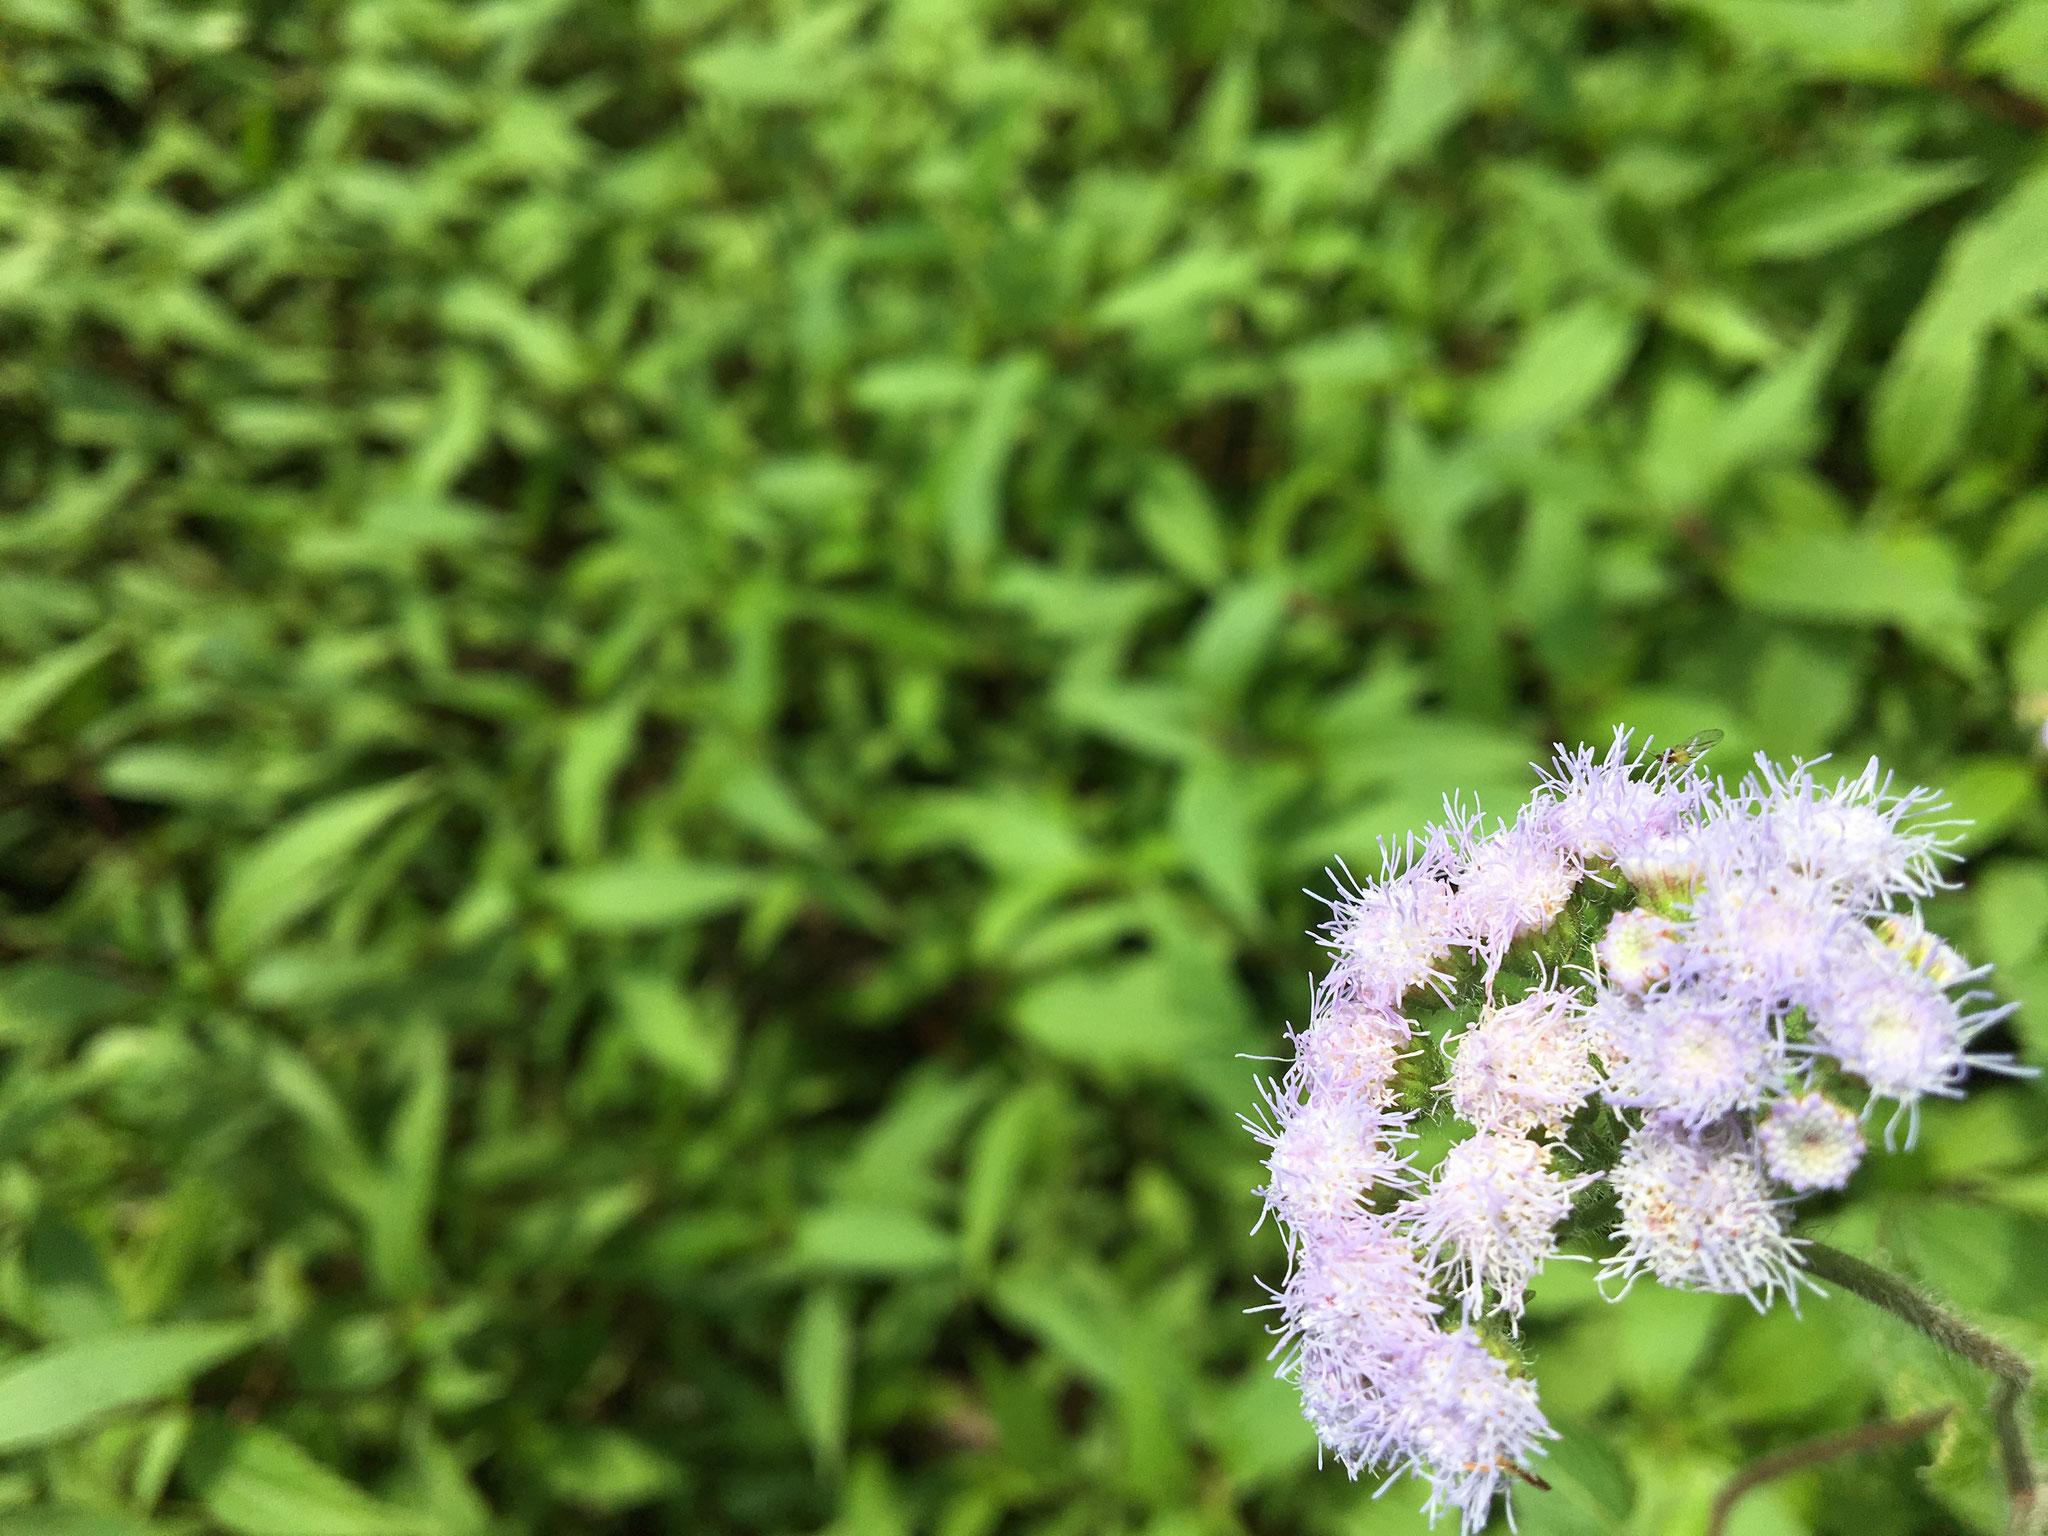 Random flower in Bukit Larut during sampling. Photo credits to Krystle